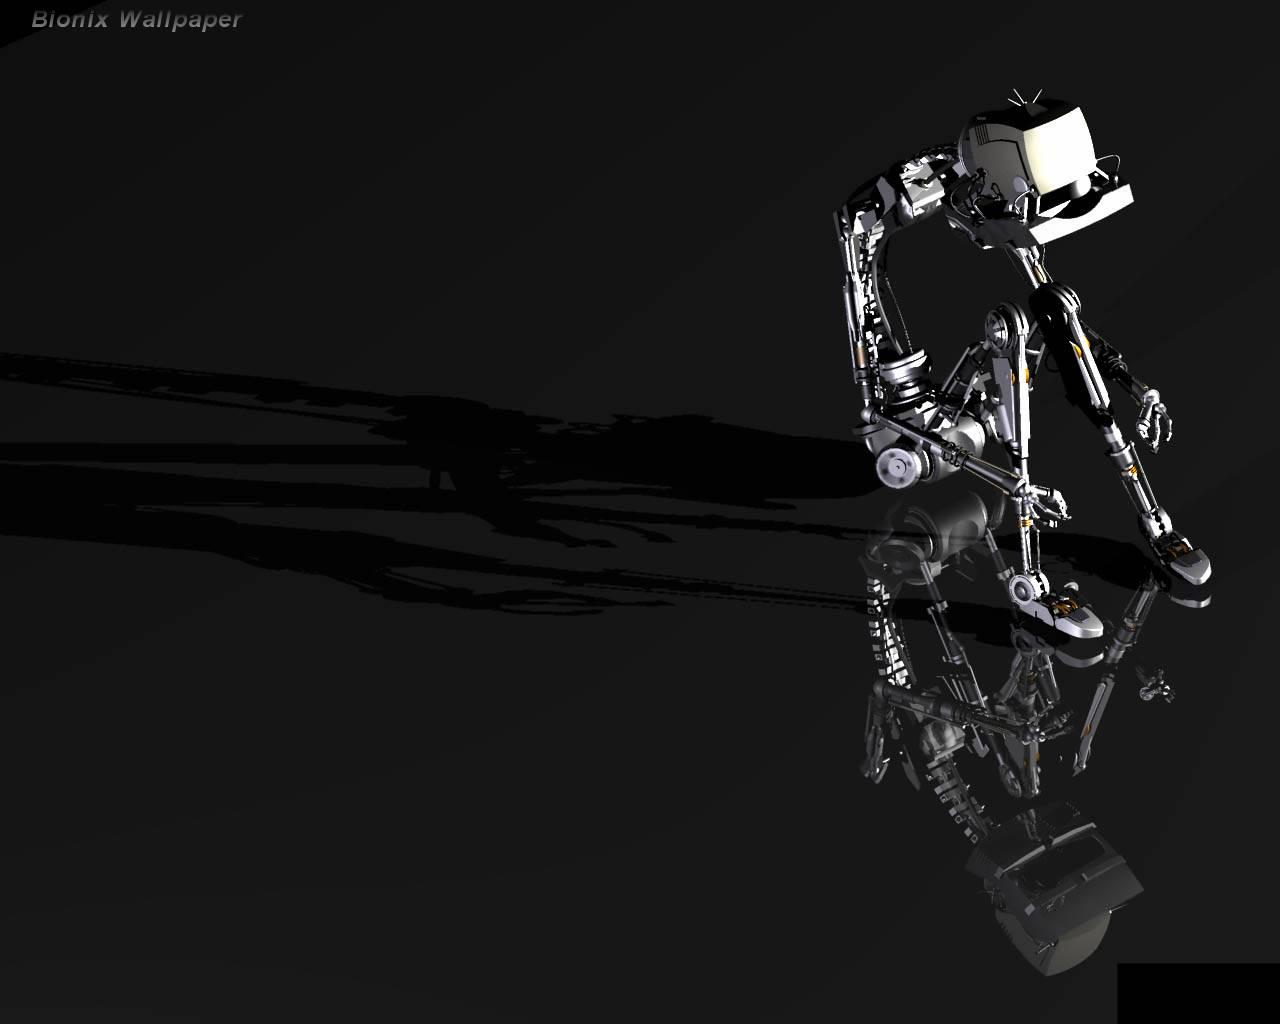 Free wallpapers: Robot wallpaper|Free download Robot wallpaper|Sexy robot wallpaper